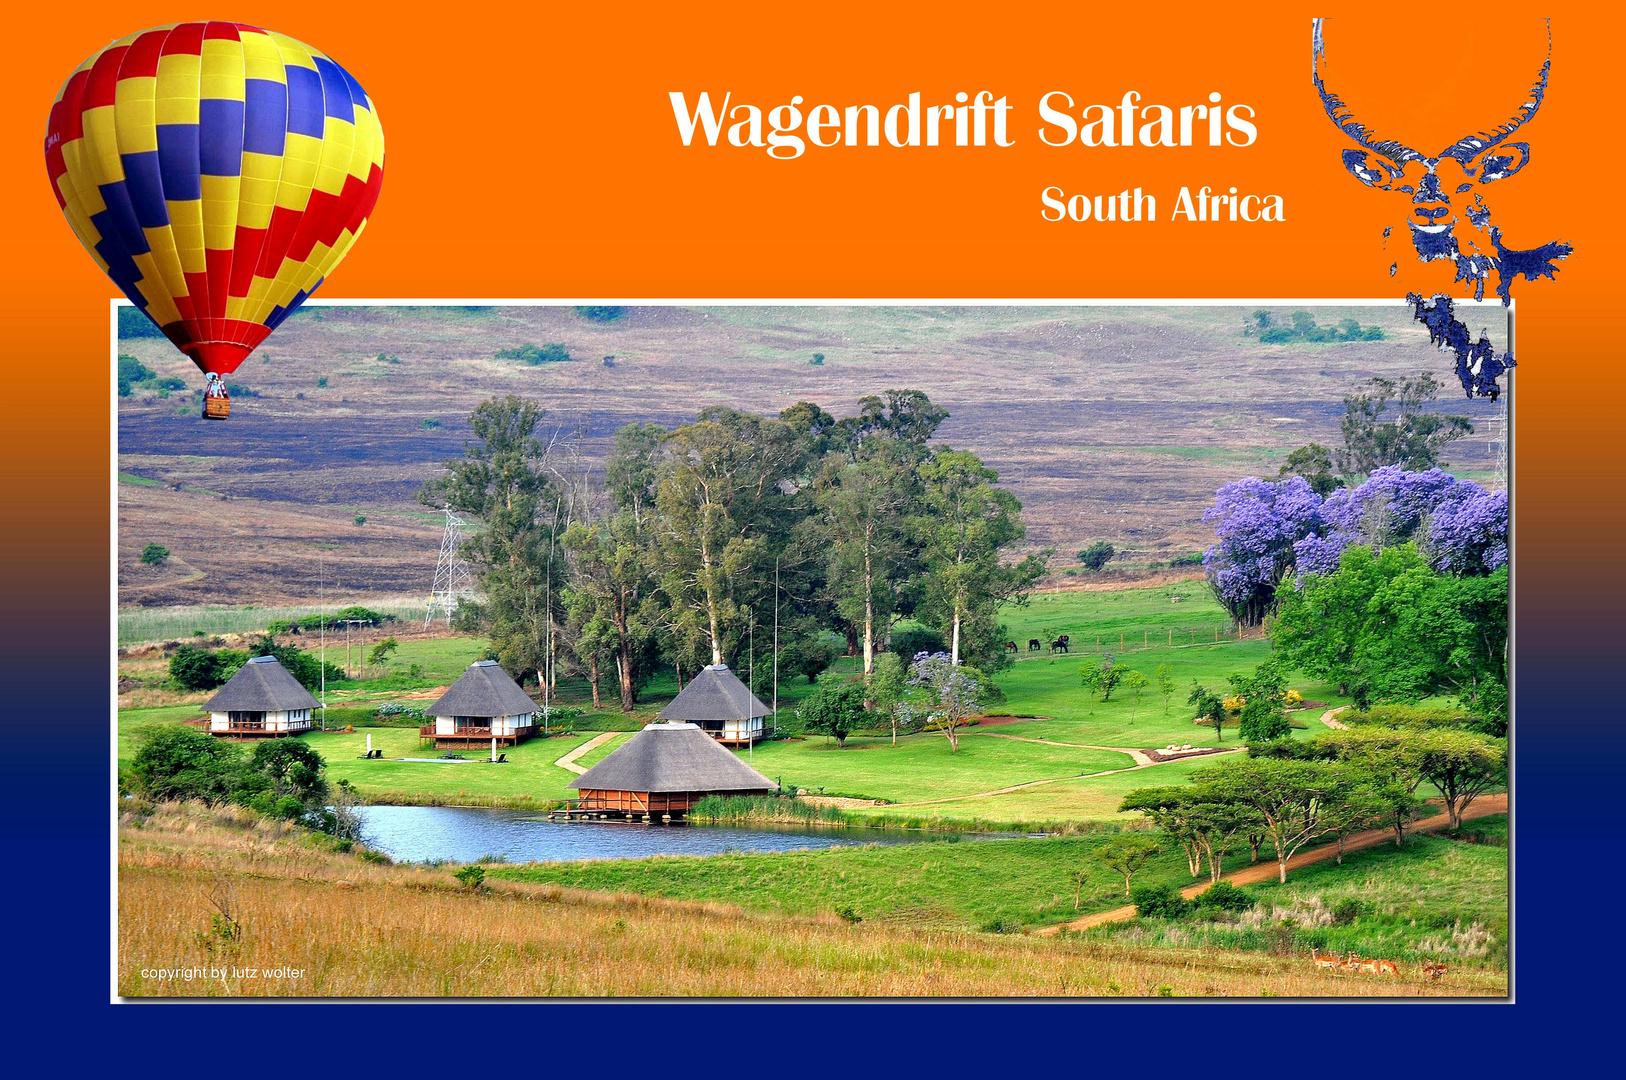 Wagendrift Safaris